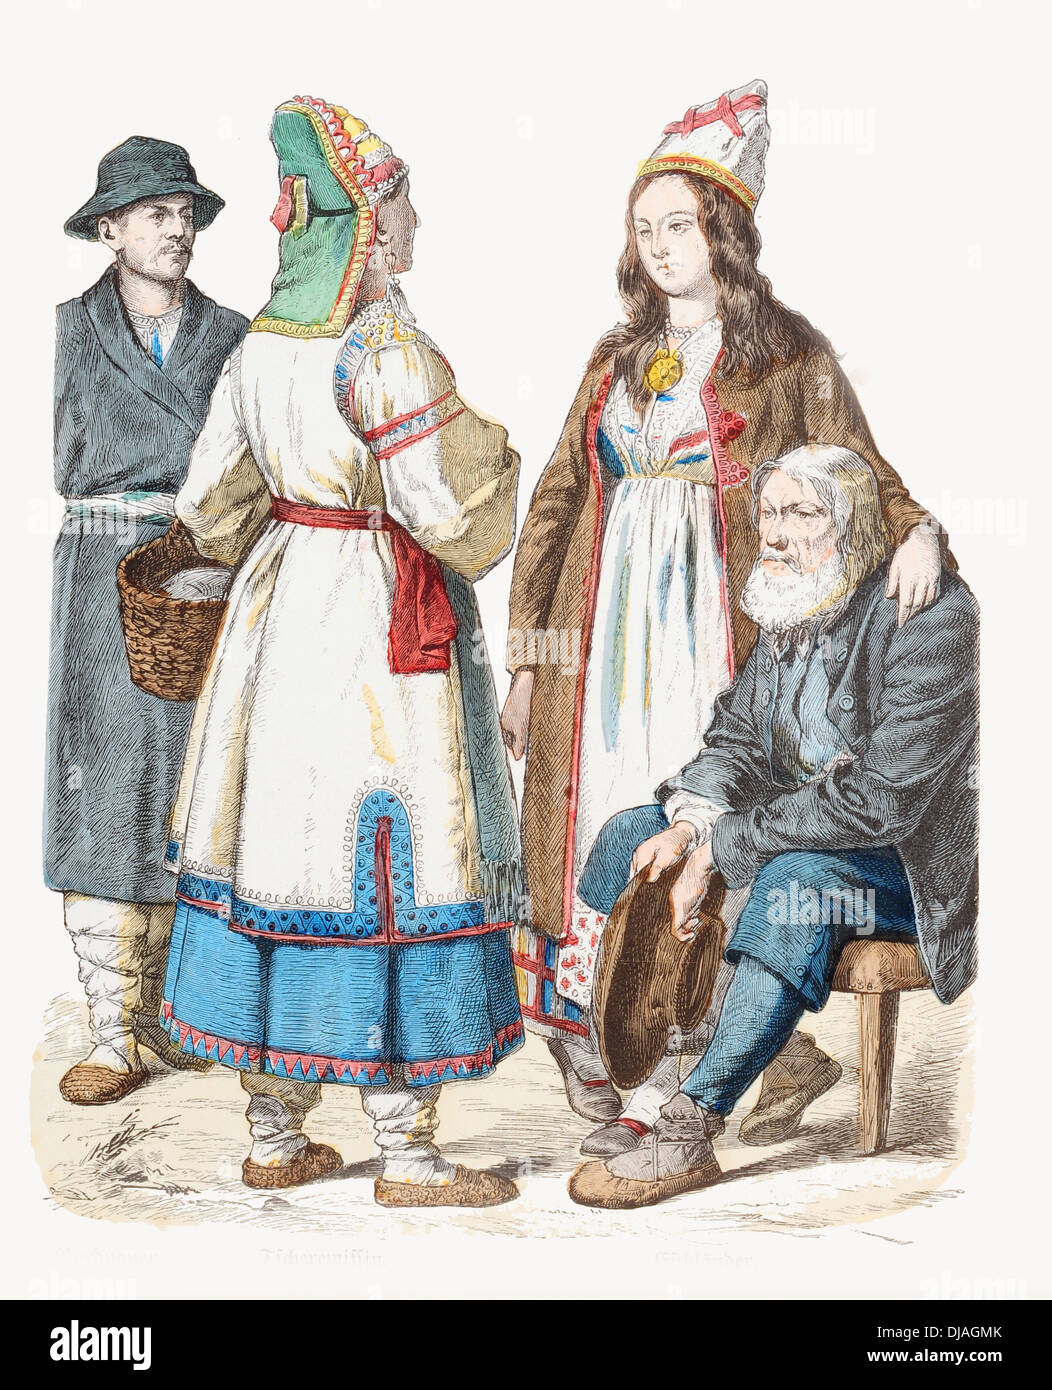 19th century XIX Russia Left to right Mordovian Finns of the Volga and Estonian couple - Stock Image